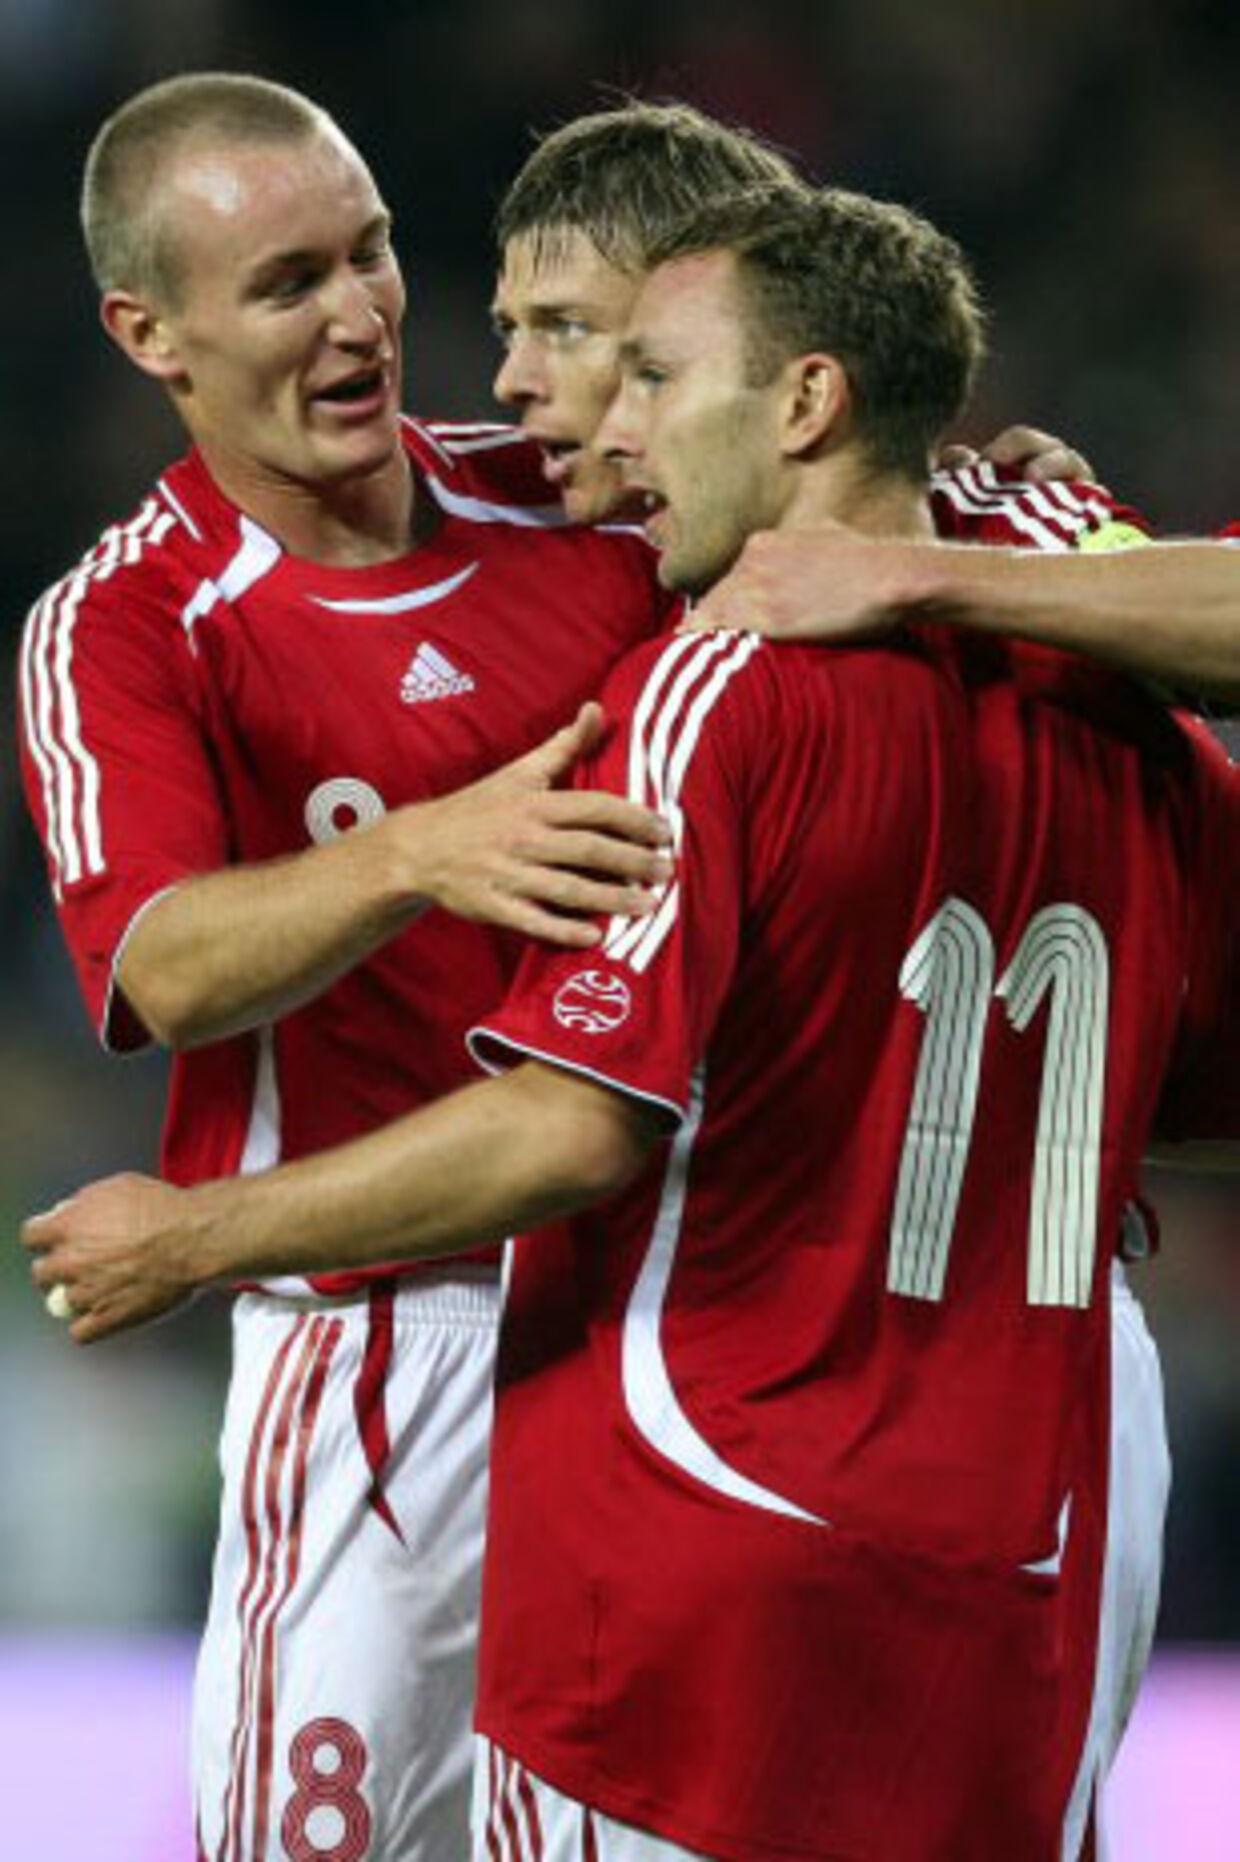 Kahlenberg, målscorer John Dahl, og Rommedahl glæder sig over, at Danmark er foran 1-0 mod Portugal. Foto: Lars Møller